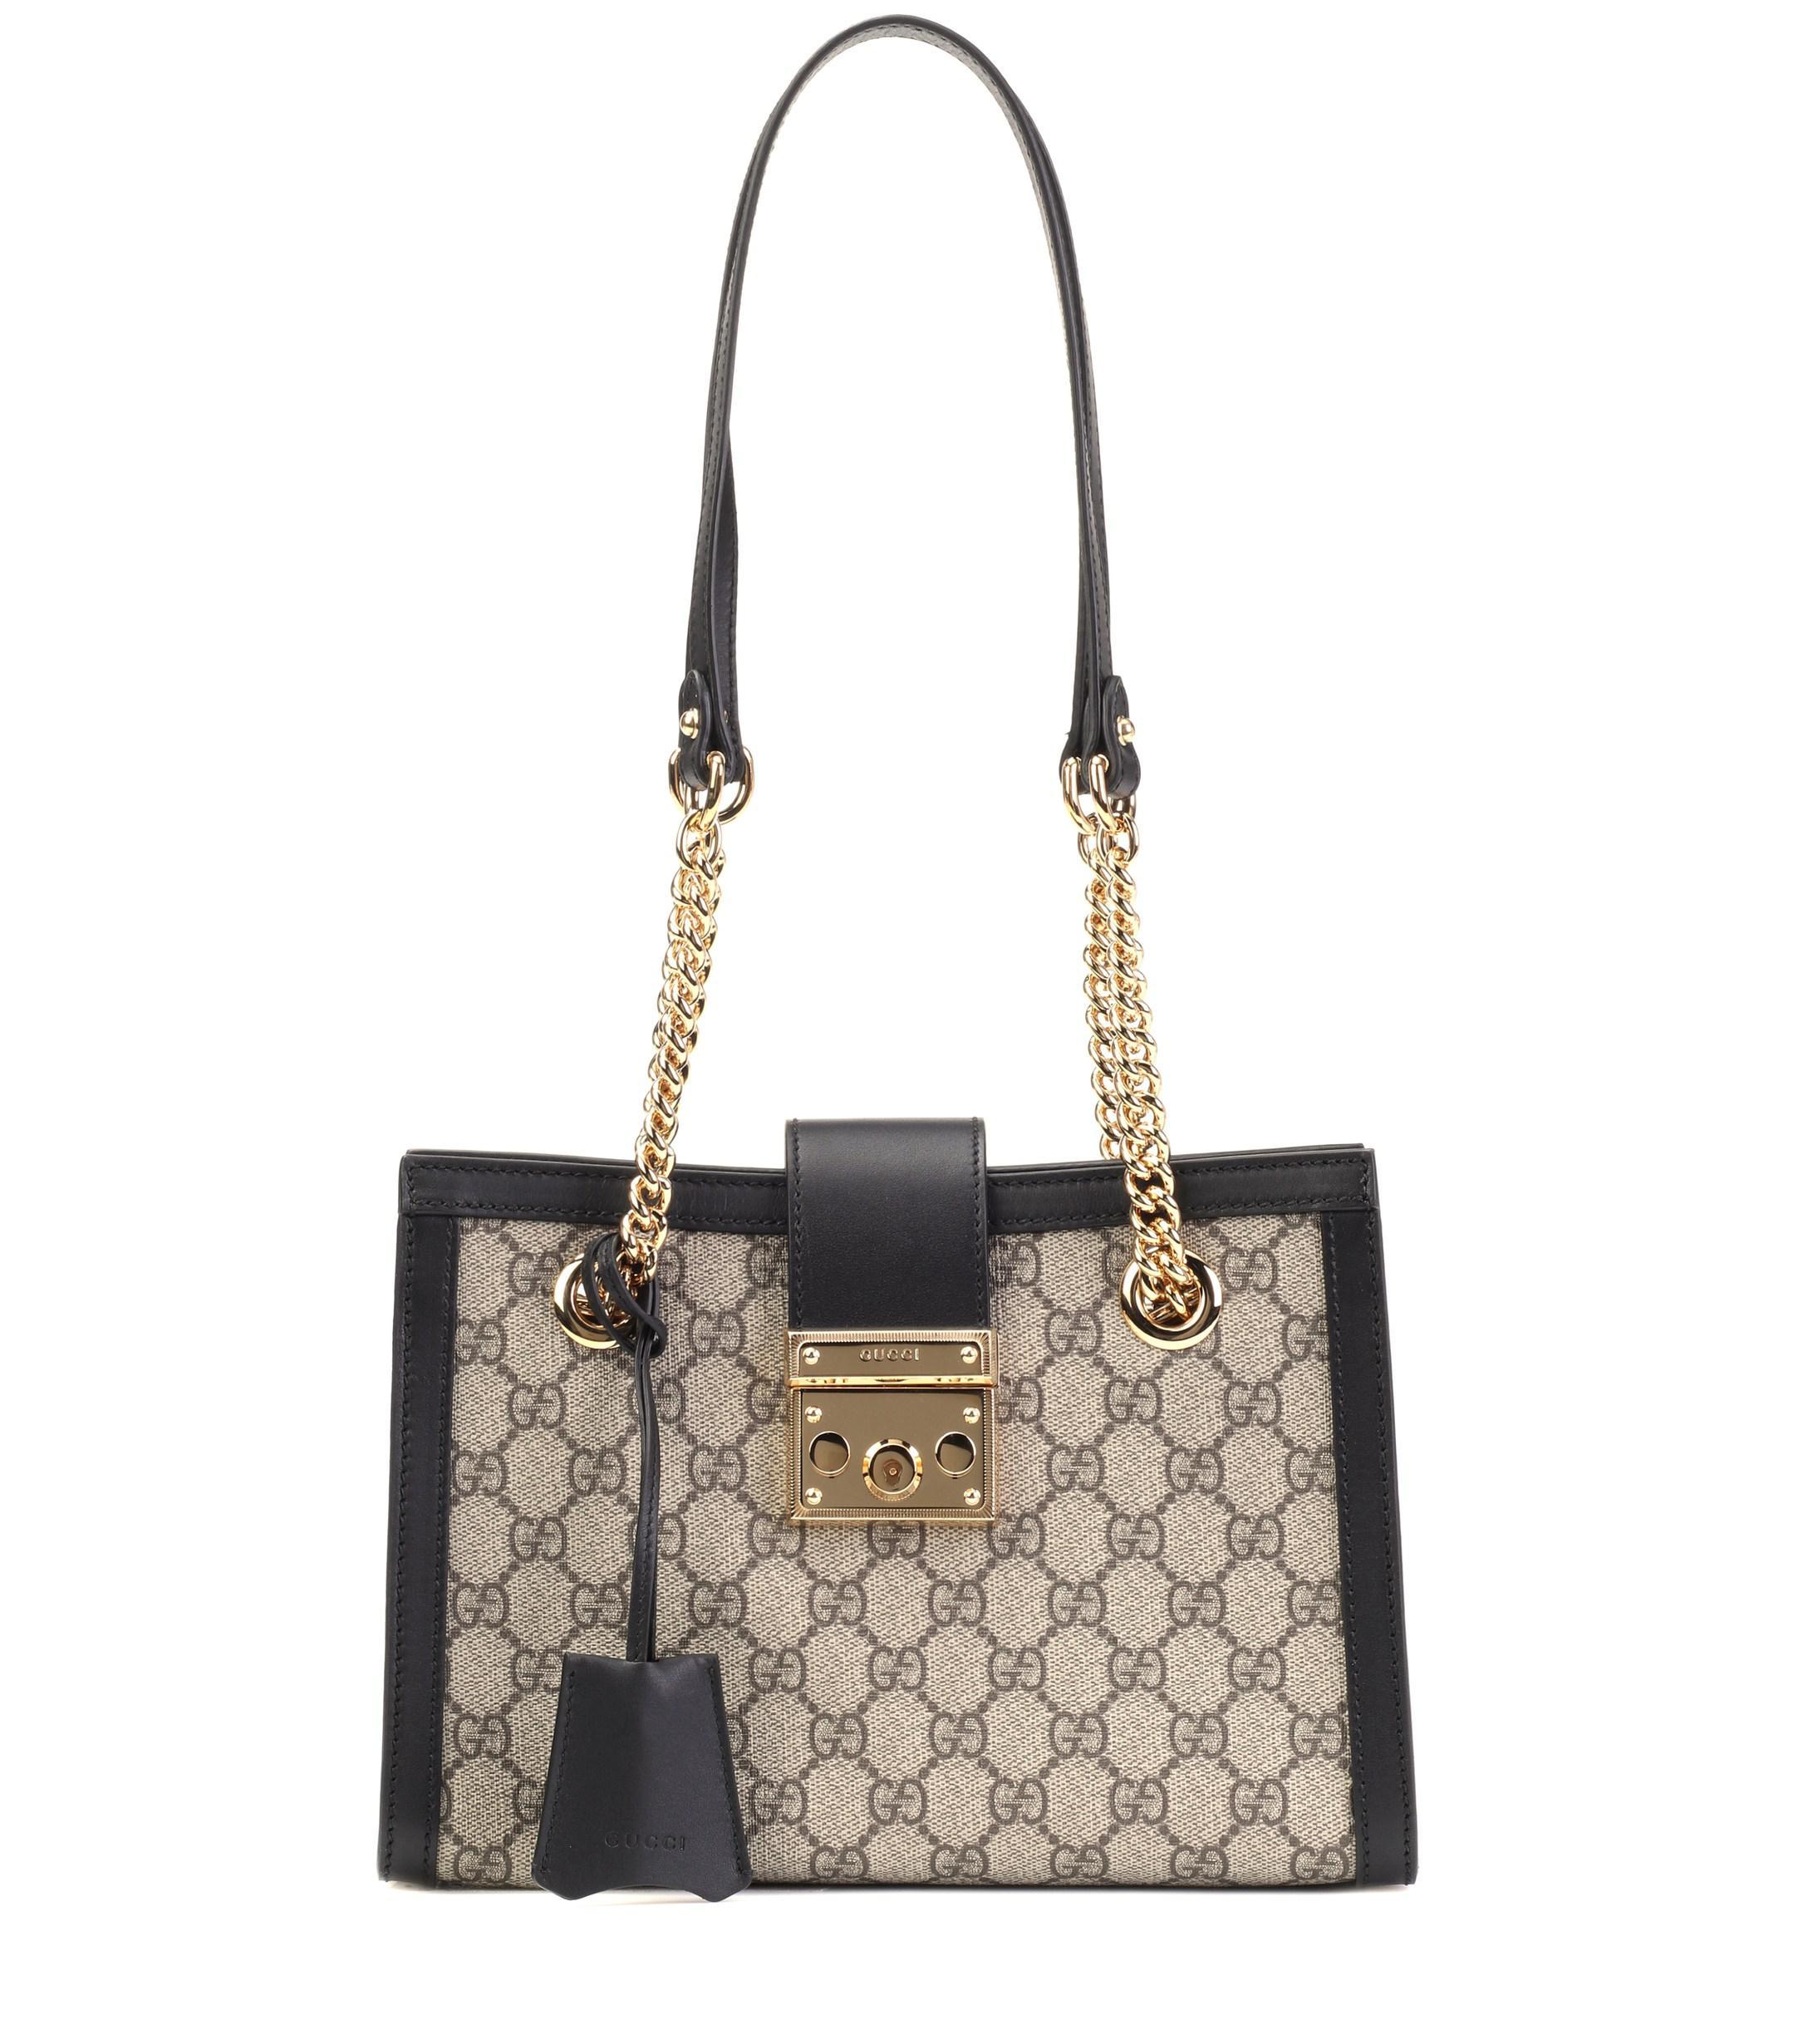 d7a4bb80965e Gucci. Women's Padlock GG Small Shoulder Bag